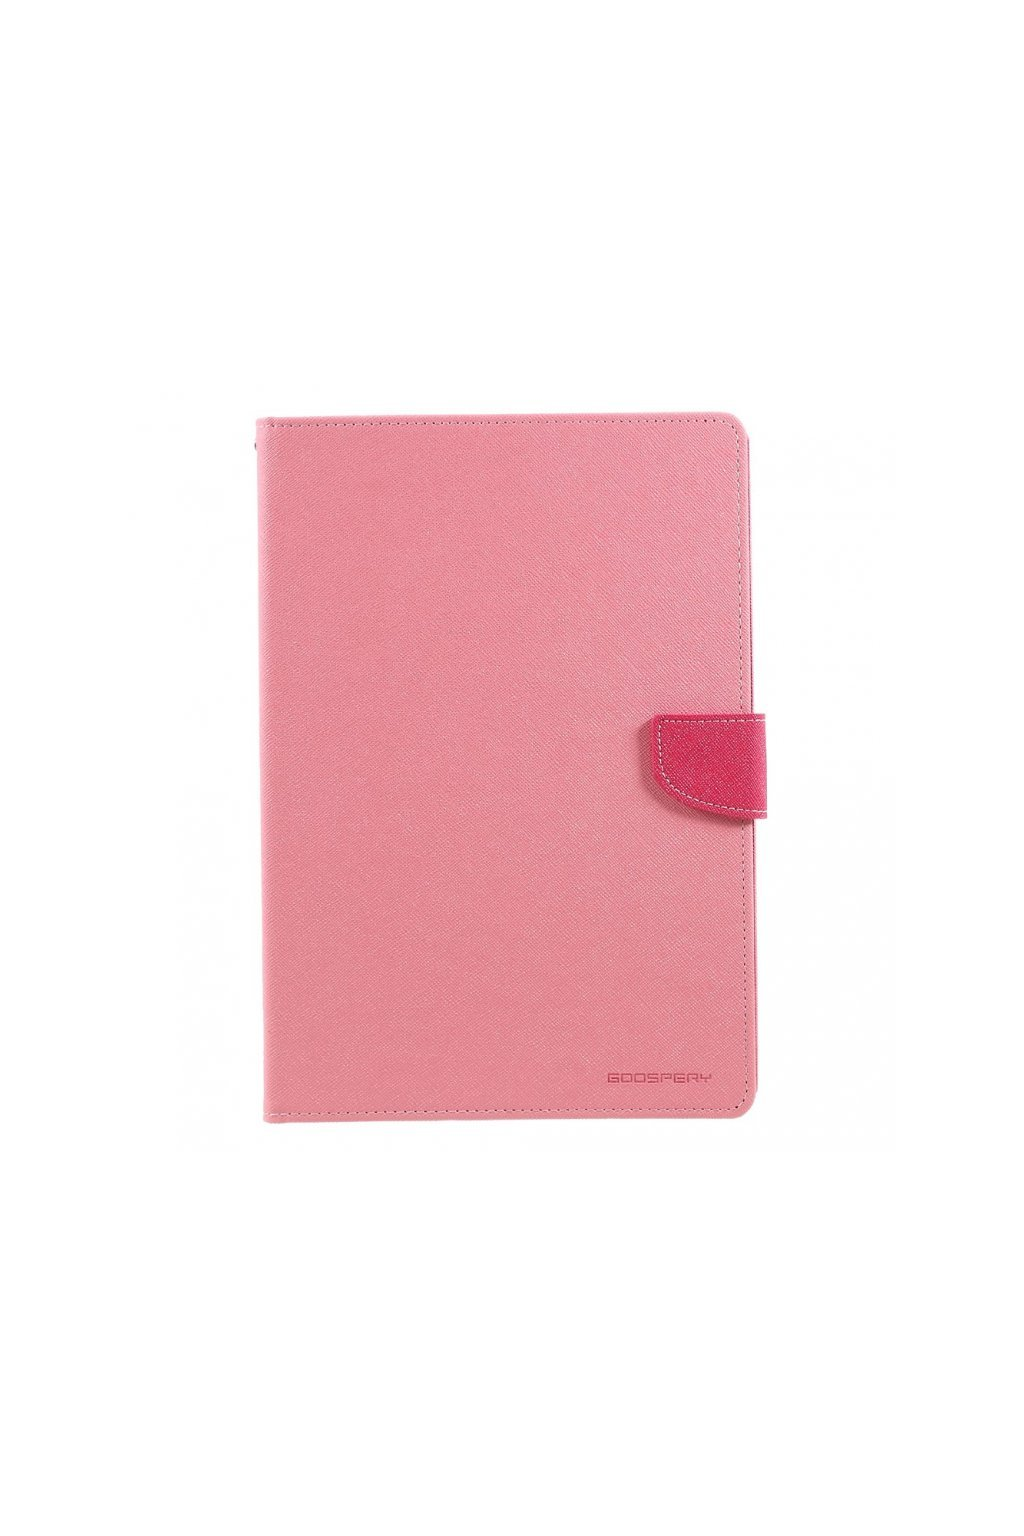 11361 pouzdro pro ipad pro 10 5 air 3 mercury fancy diary pink hotpink